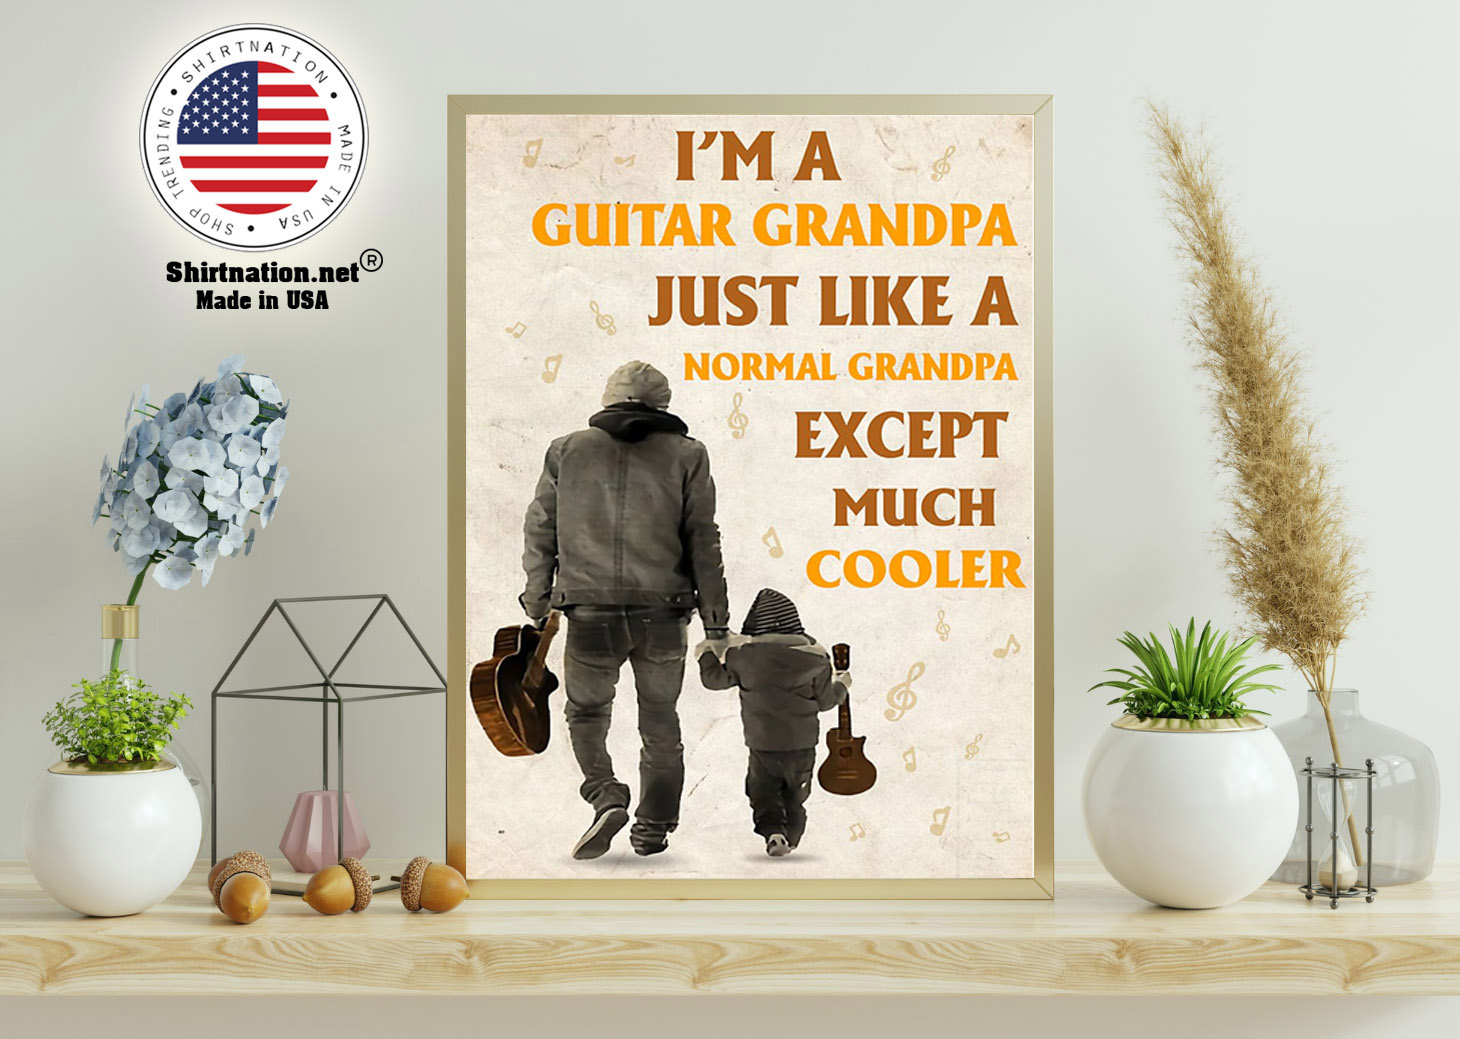 Im a guitar grandpa just like a normal grandpa except much cooler poster